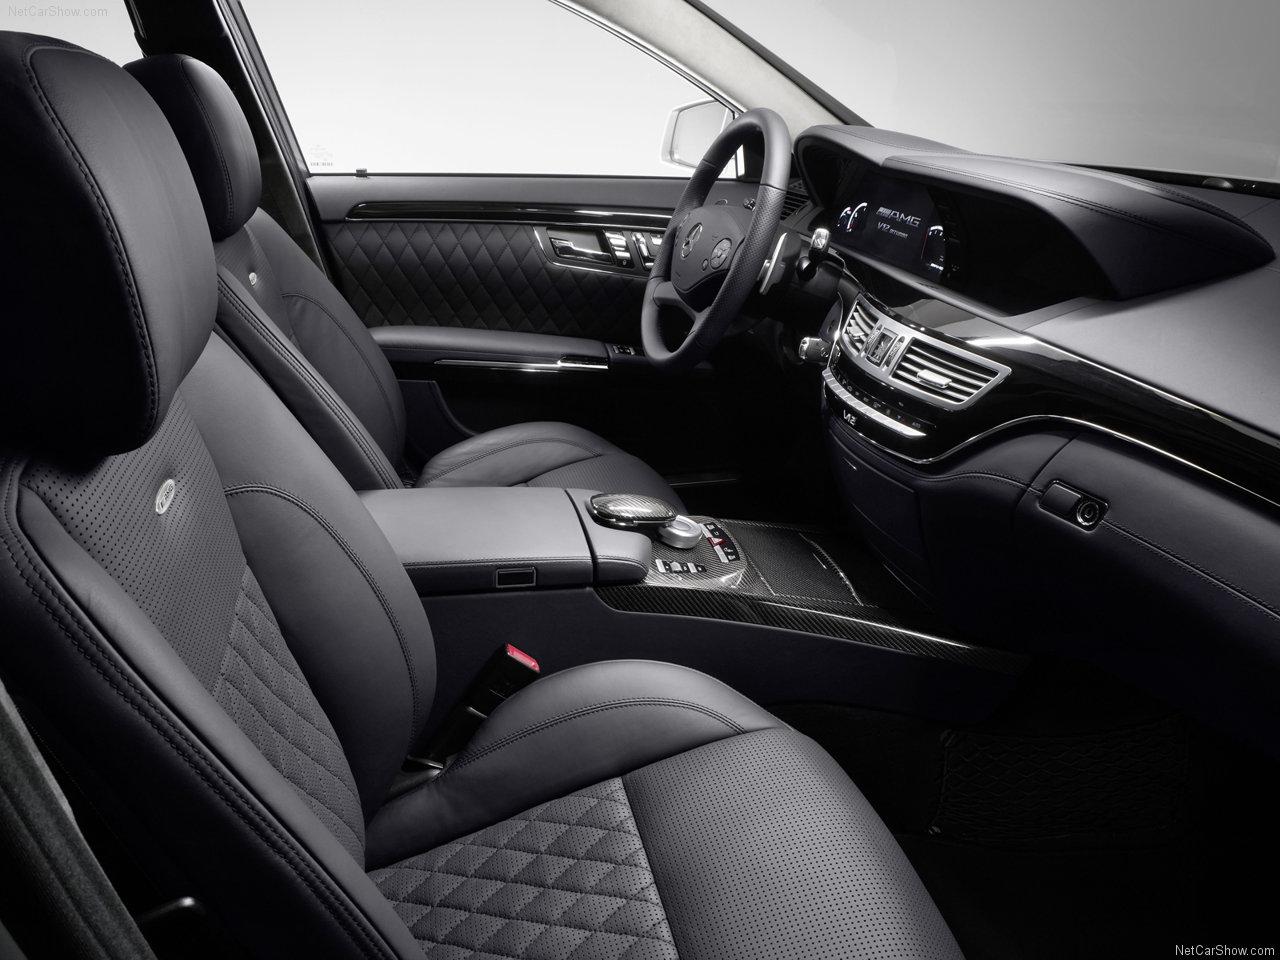 http://2.bp.blogspot.com/_3V1YR3u6VBg/S8RYxC1zyEI/AAAAAAAAB5E/XHIQBTcX404/s1600/Mercedes-Benz-S65_AMG_2010_1280x960_wallpaper_06.jpg